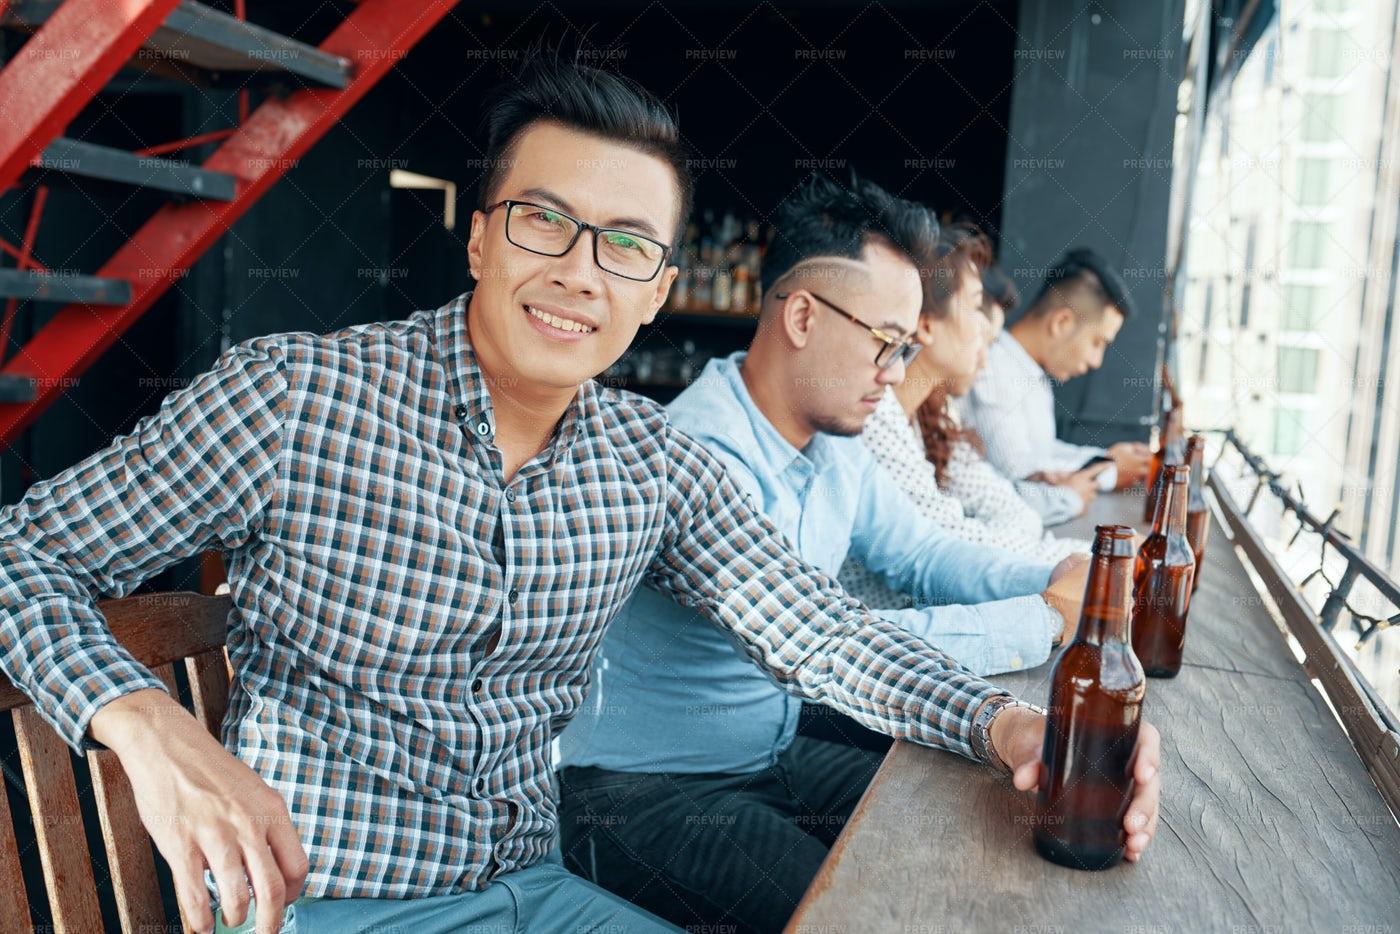 Businessman Drinking Beer At Bar: Stock Photos